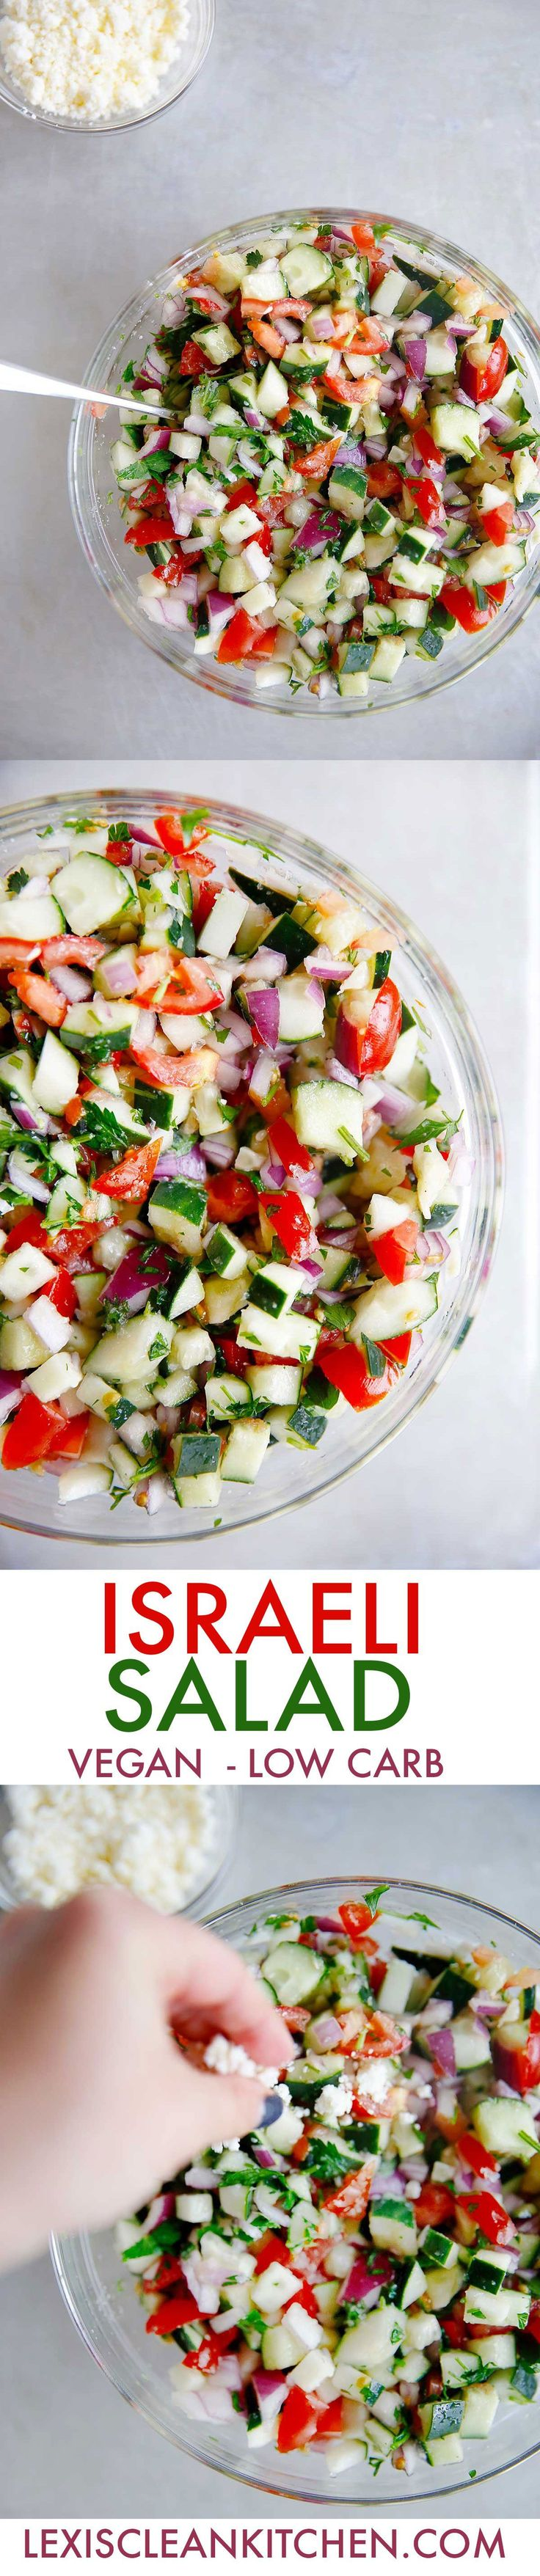 Israeli Salad {low-carb, vegan option, grain-free} | Lexi's Clean Kitchen